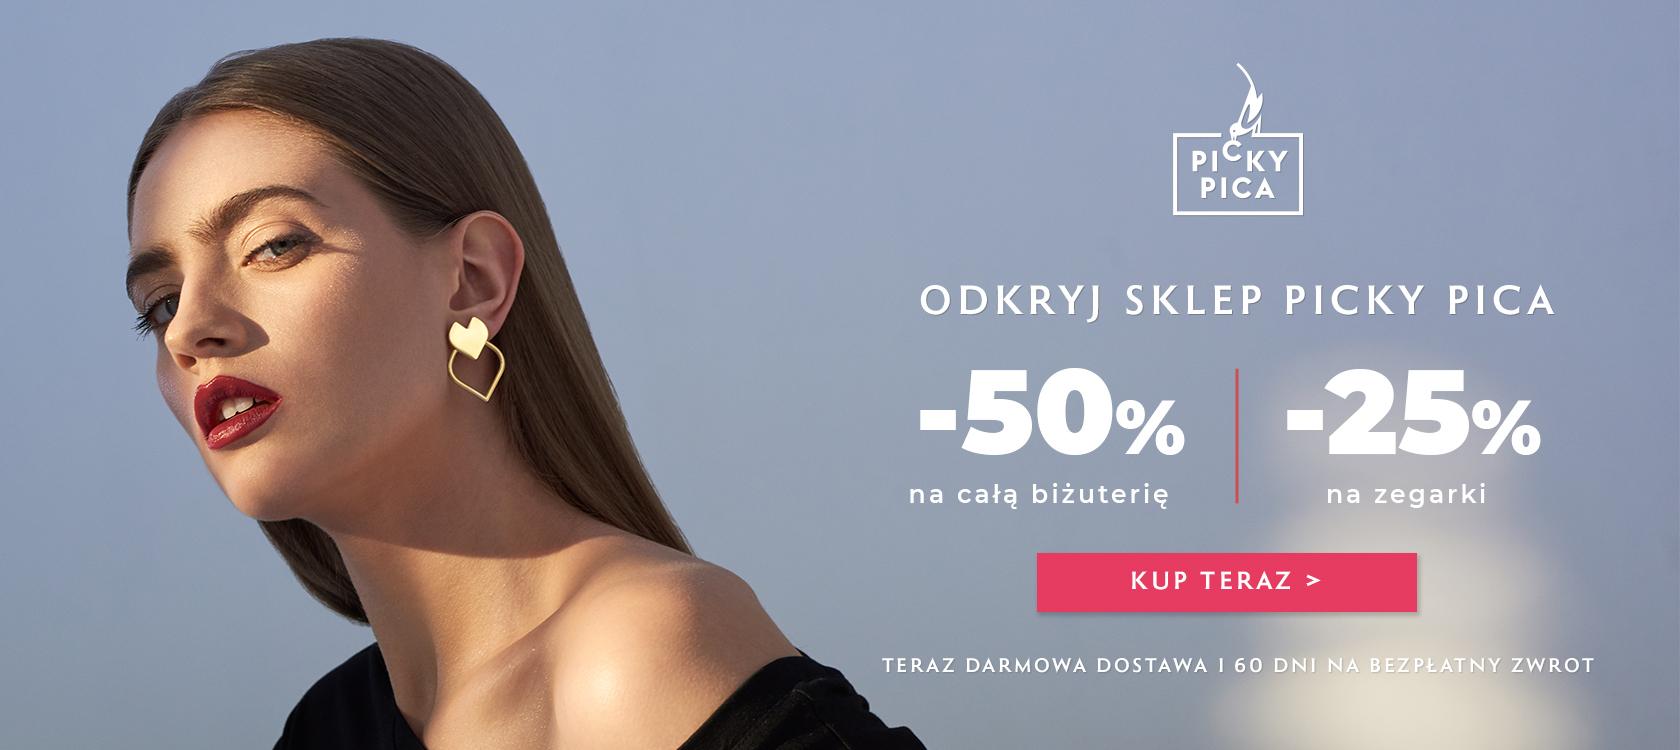 W.Kruk: 50% rabatu na całą biżuterię Picky Pica i i 25% rabatu na zegarki